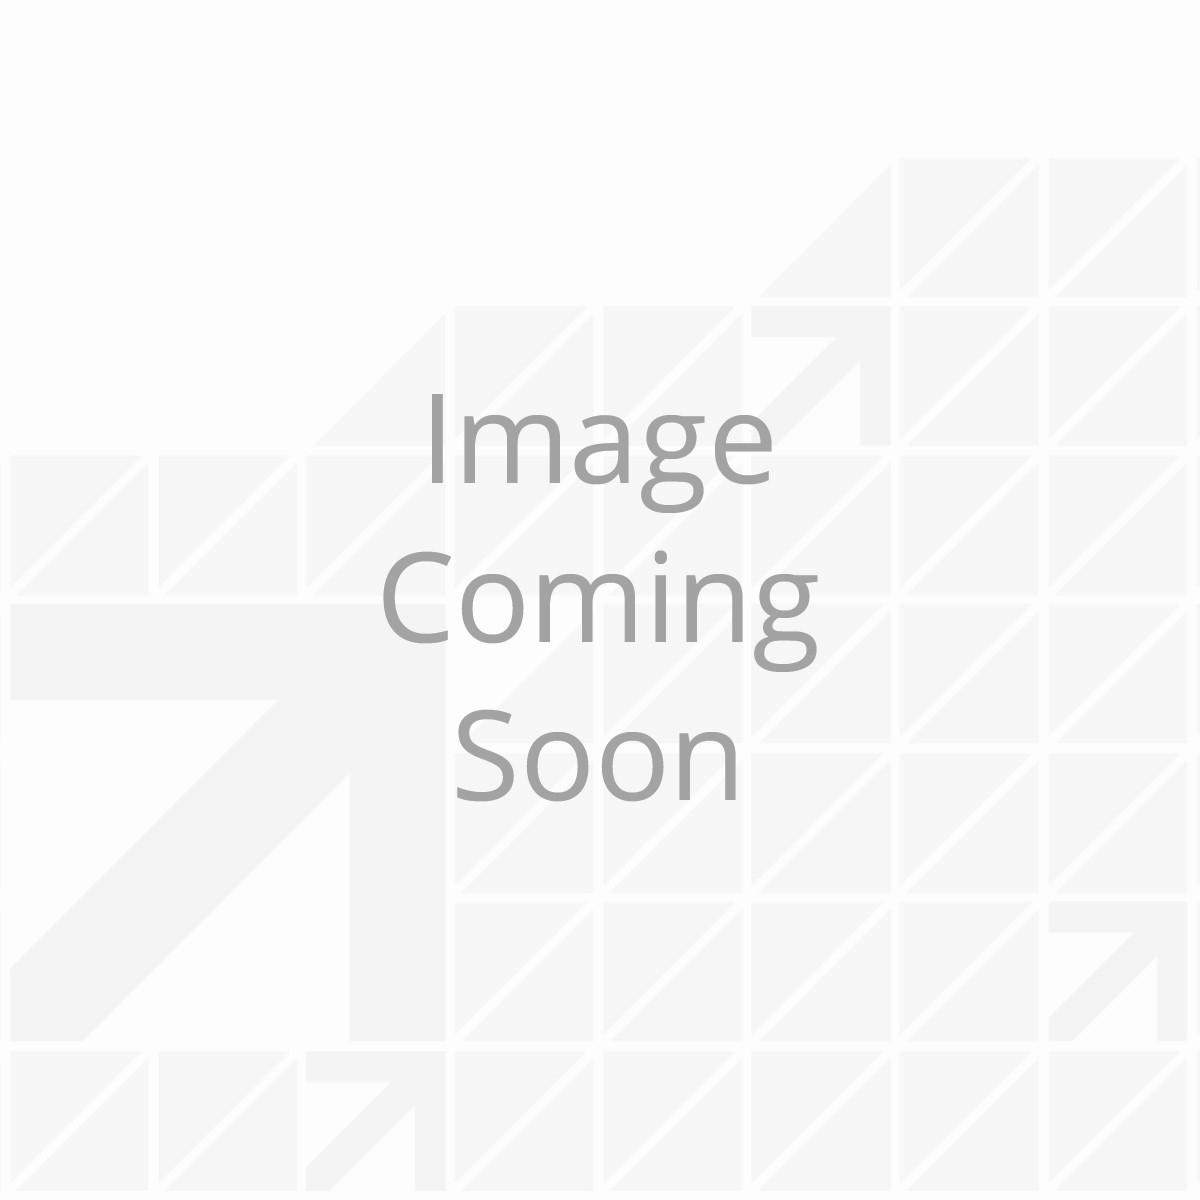 21' Power & Hybrid Awning Roller Assembly - Prepflex Black Fade